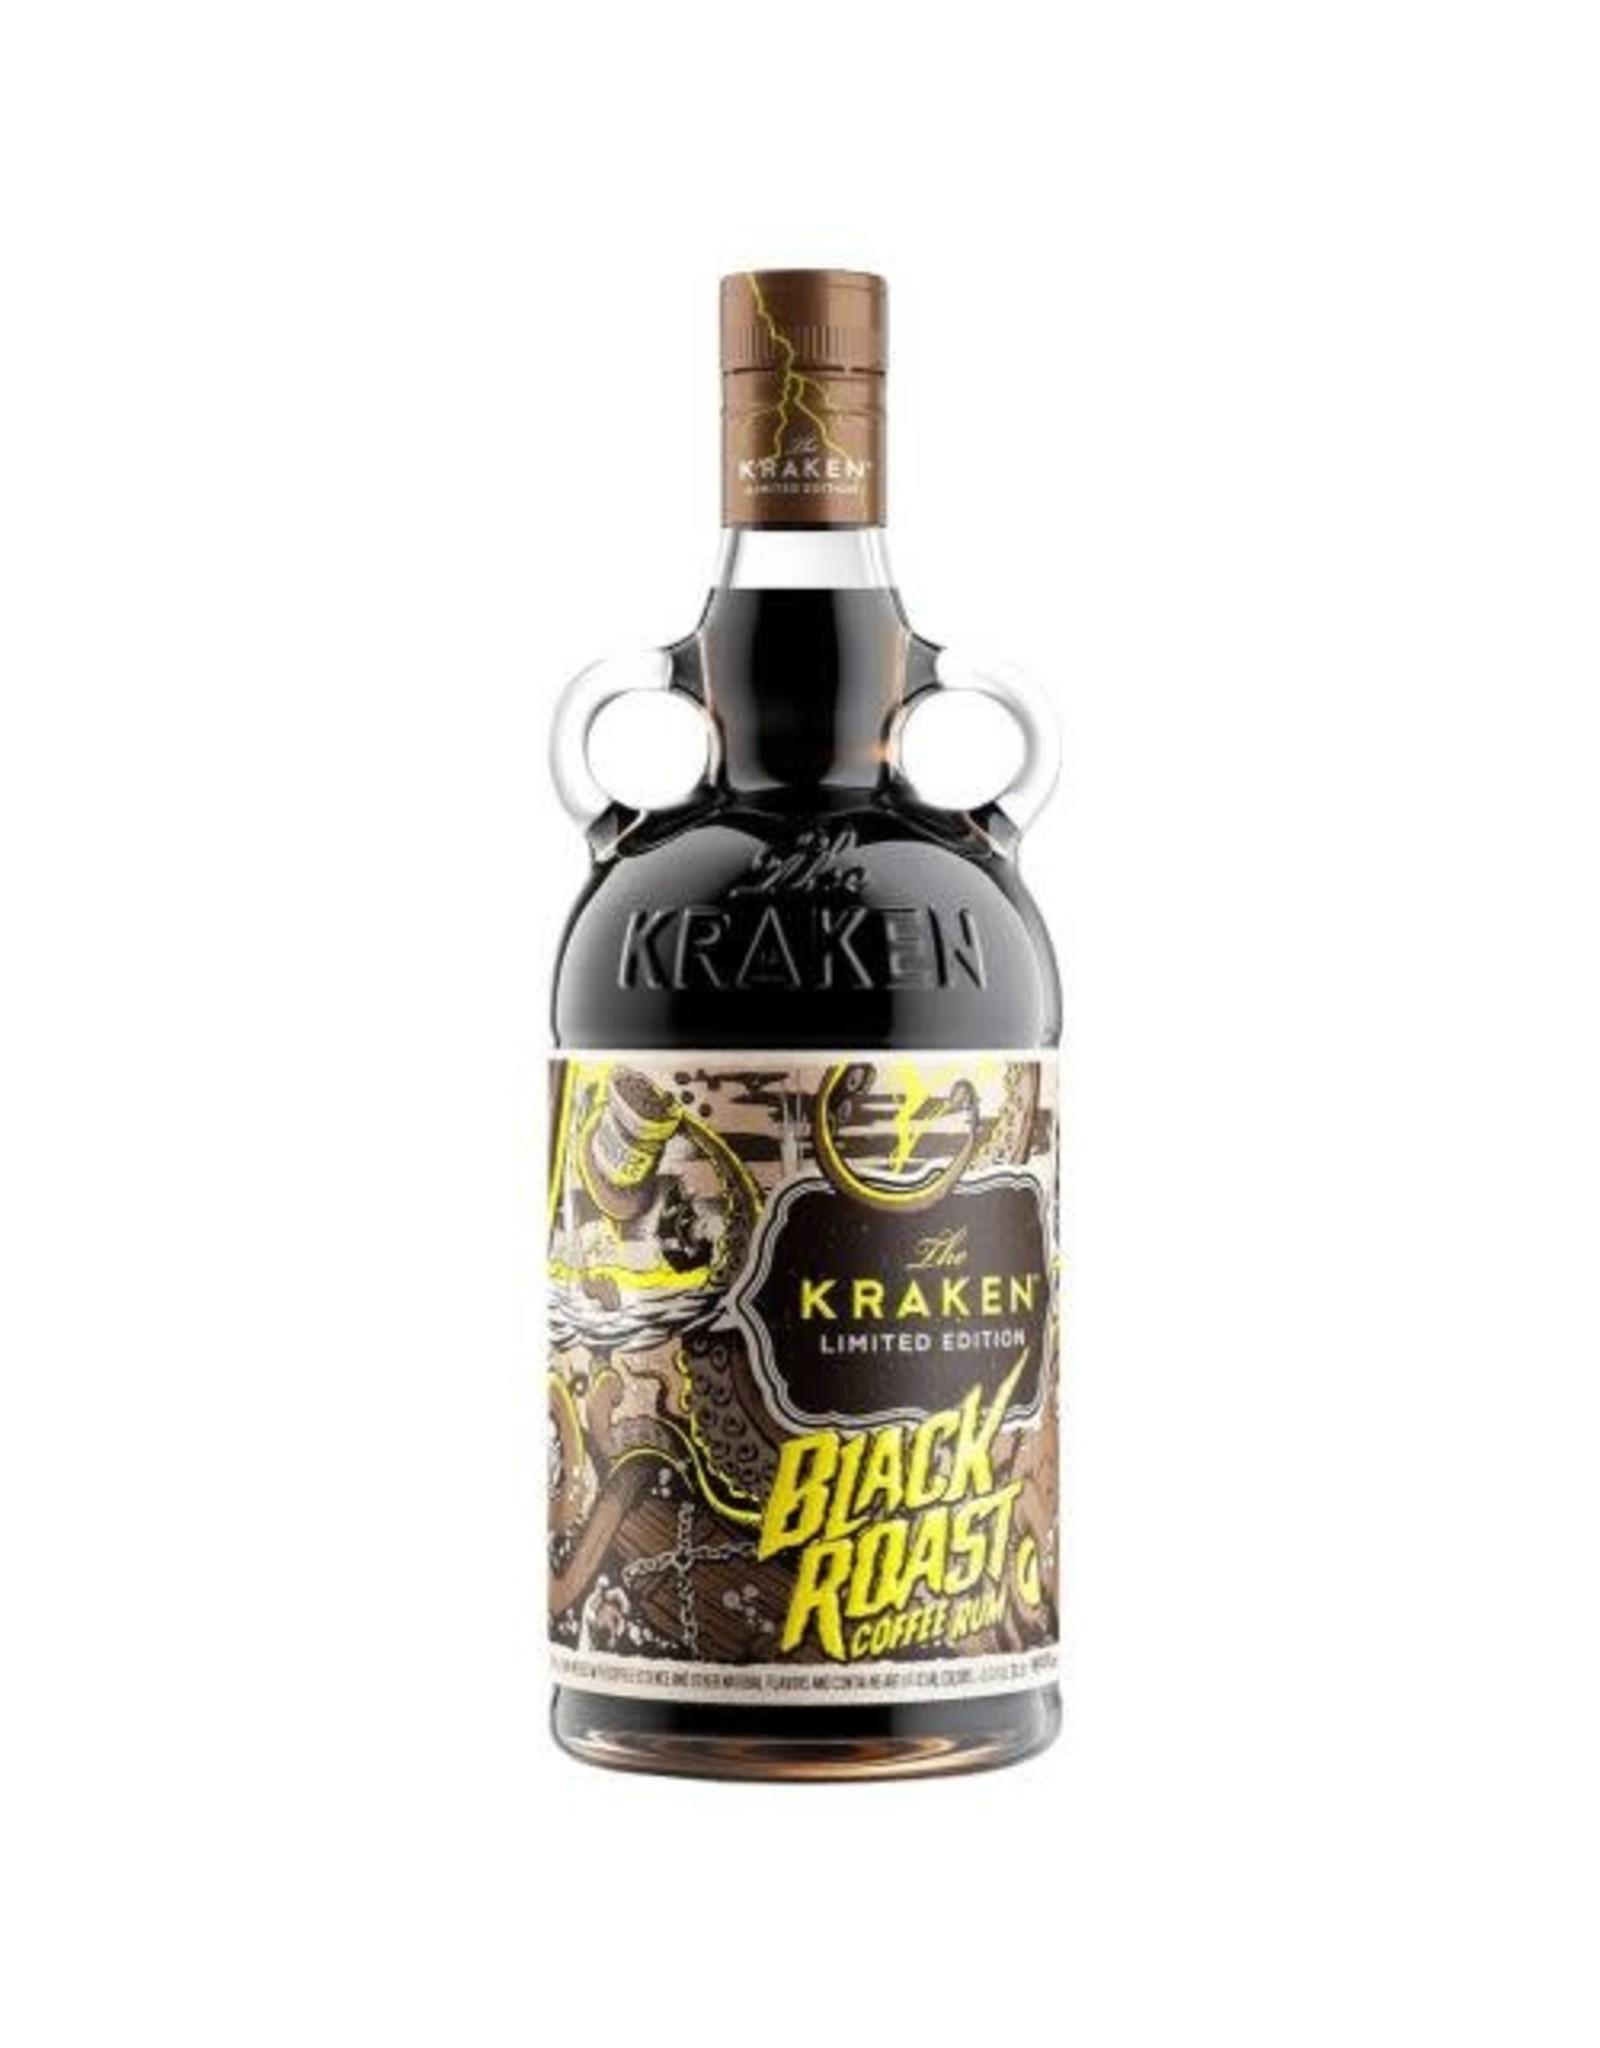 USA Kraken Black Roast Limited Edition